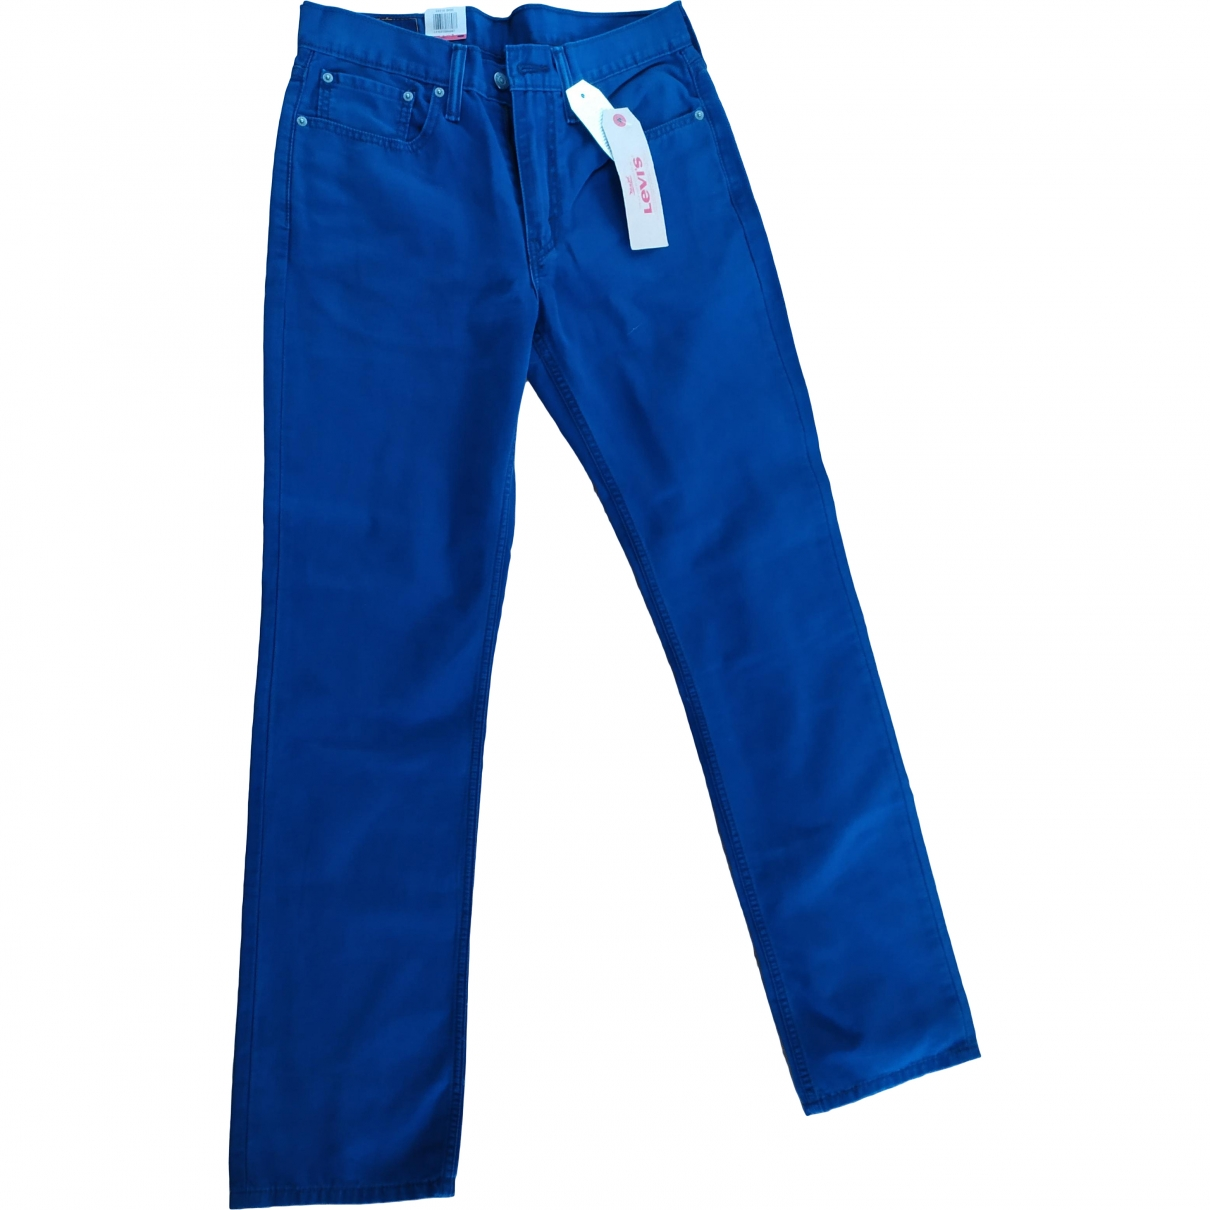 Levi's \N Blue Denim - Jeans Trousers for Men 32 UK - US